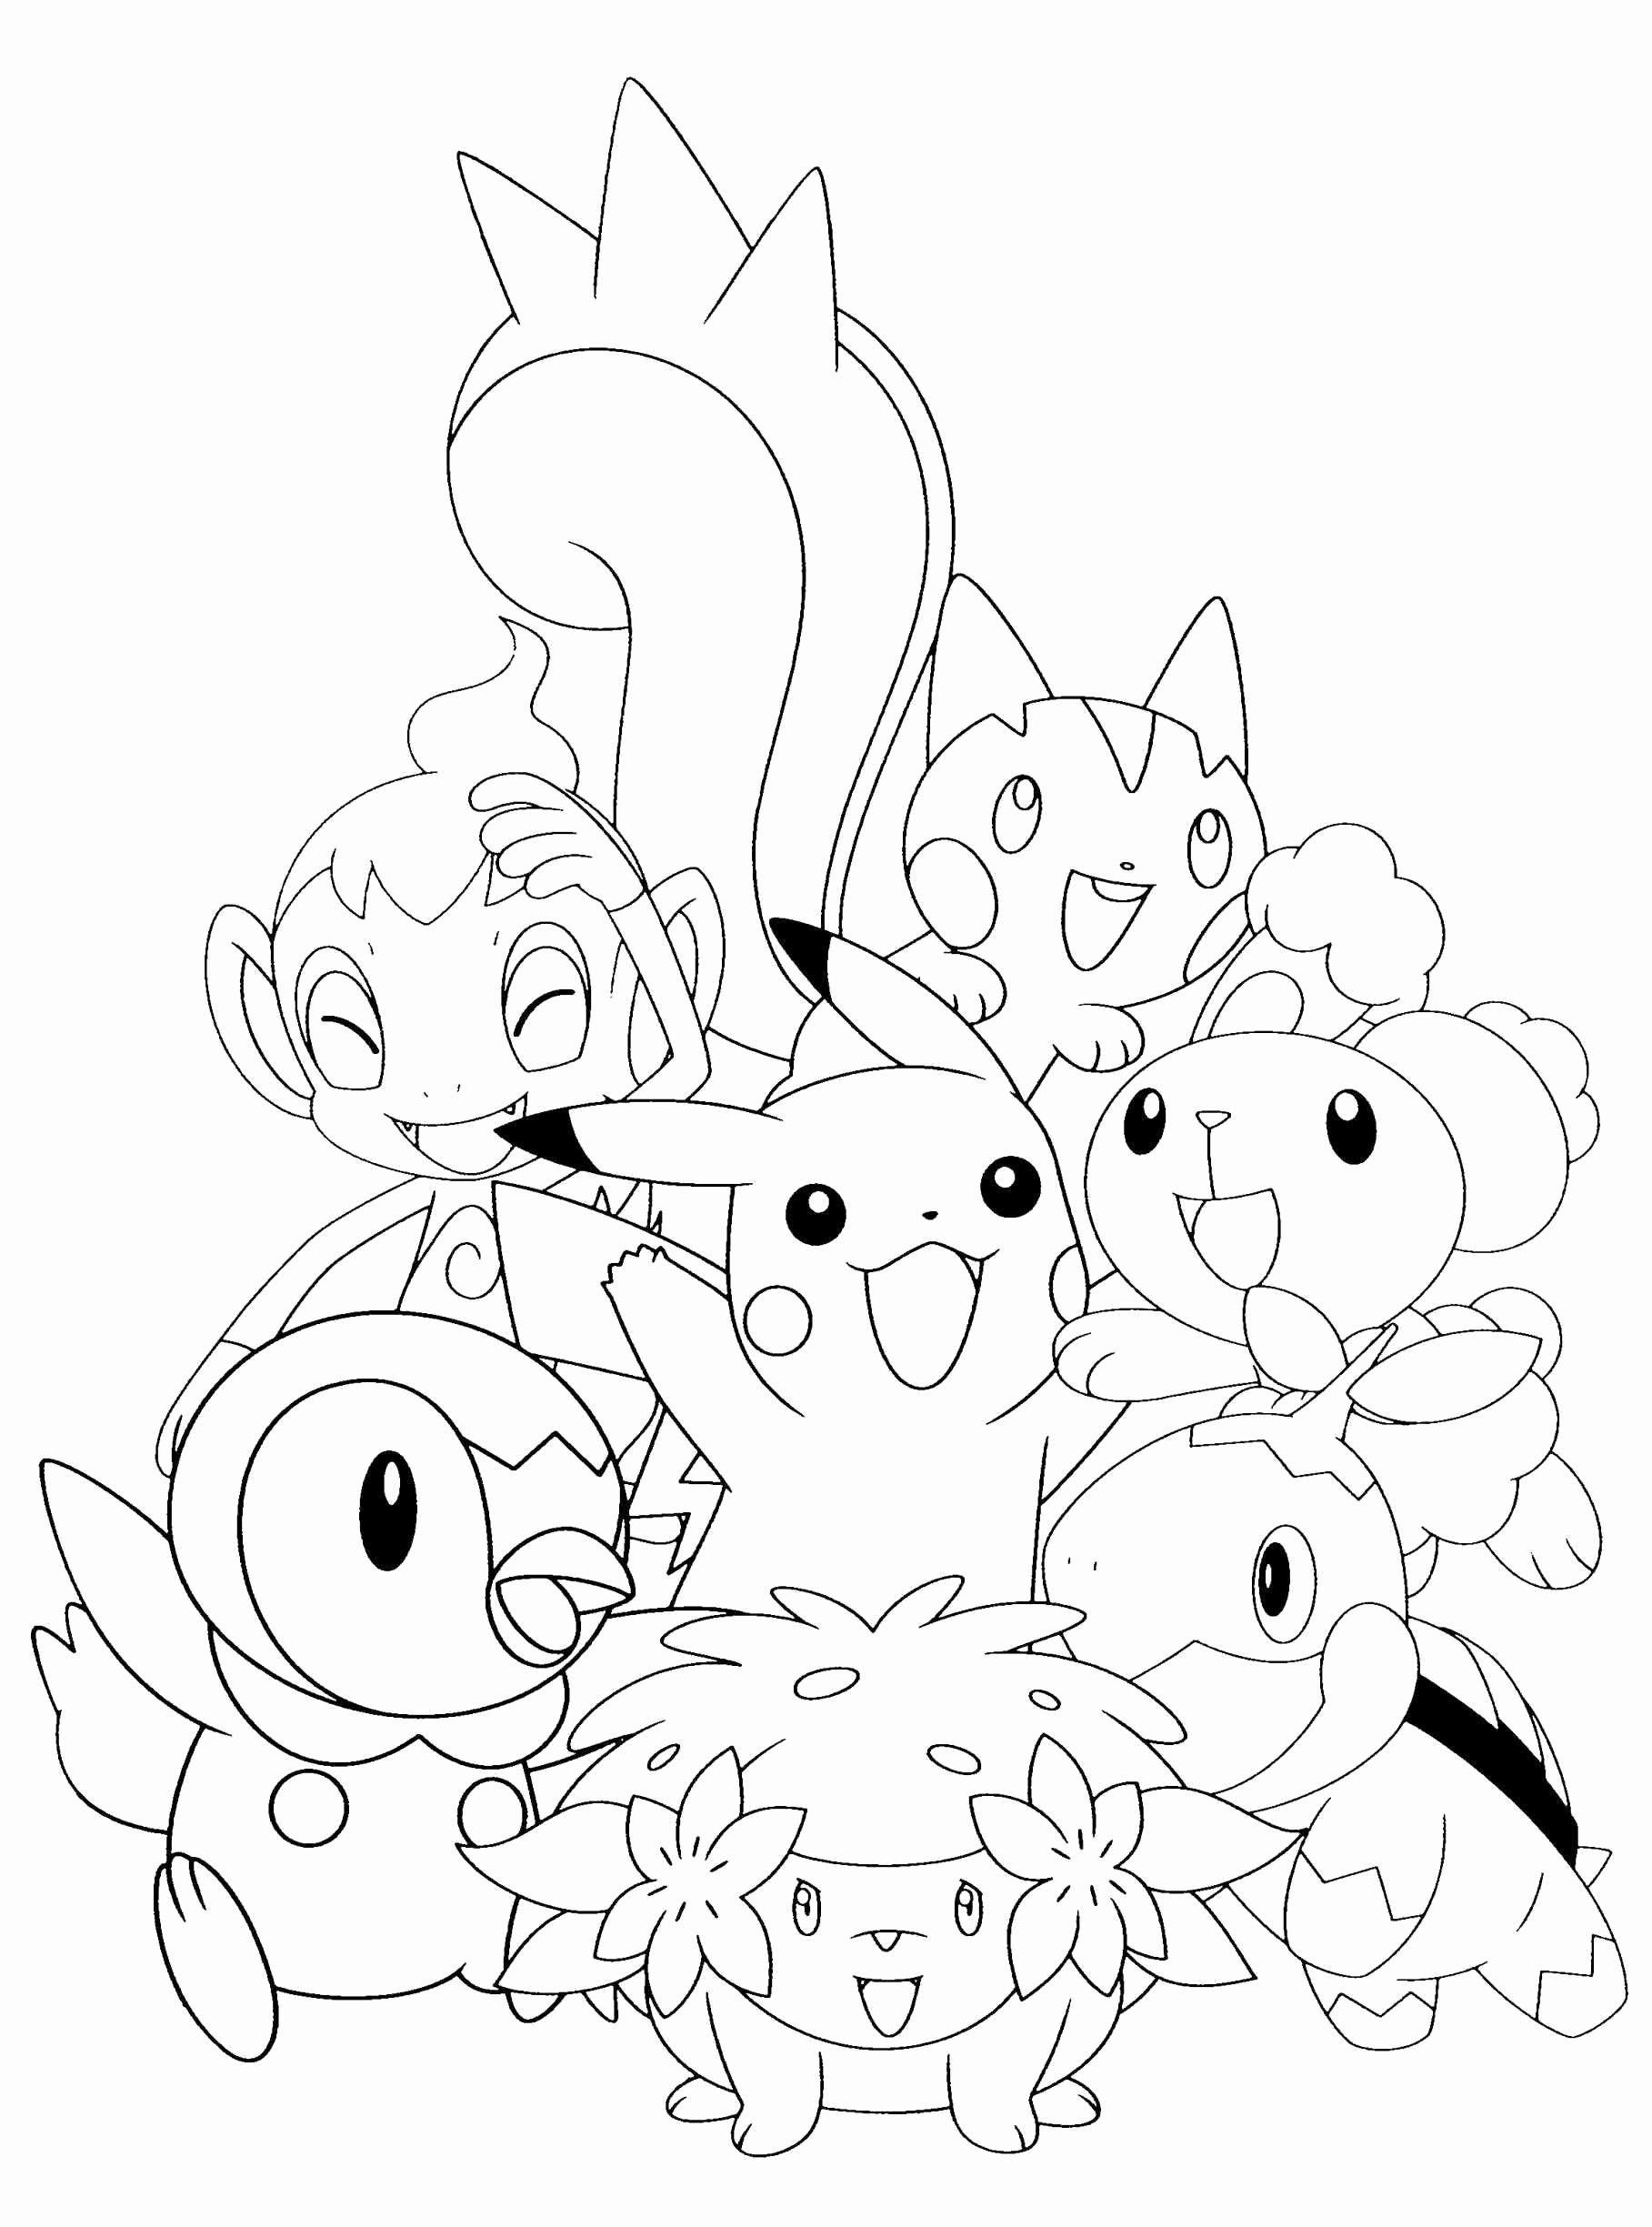 Malvorlagen Kostenlos Pokemon Aiquruguay